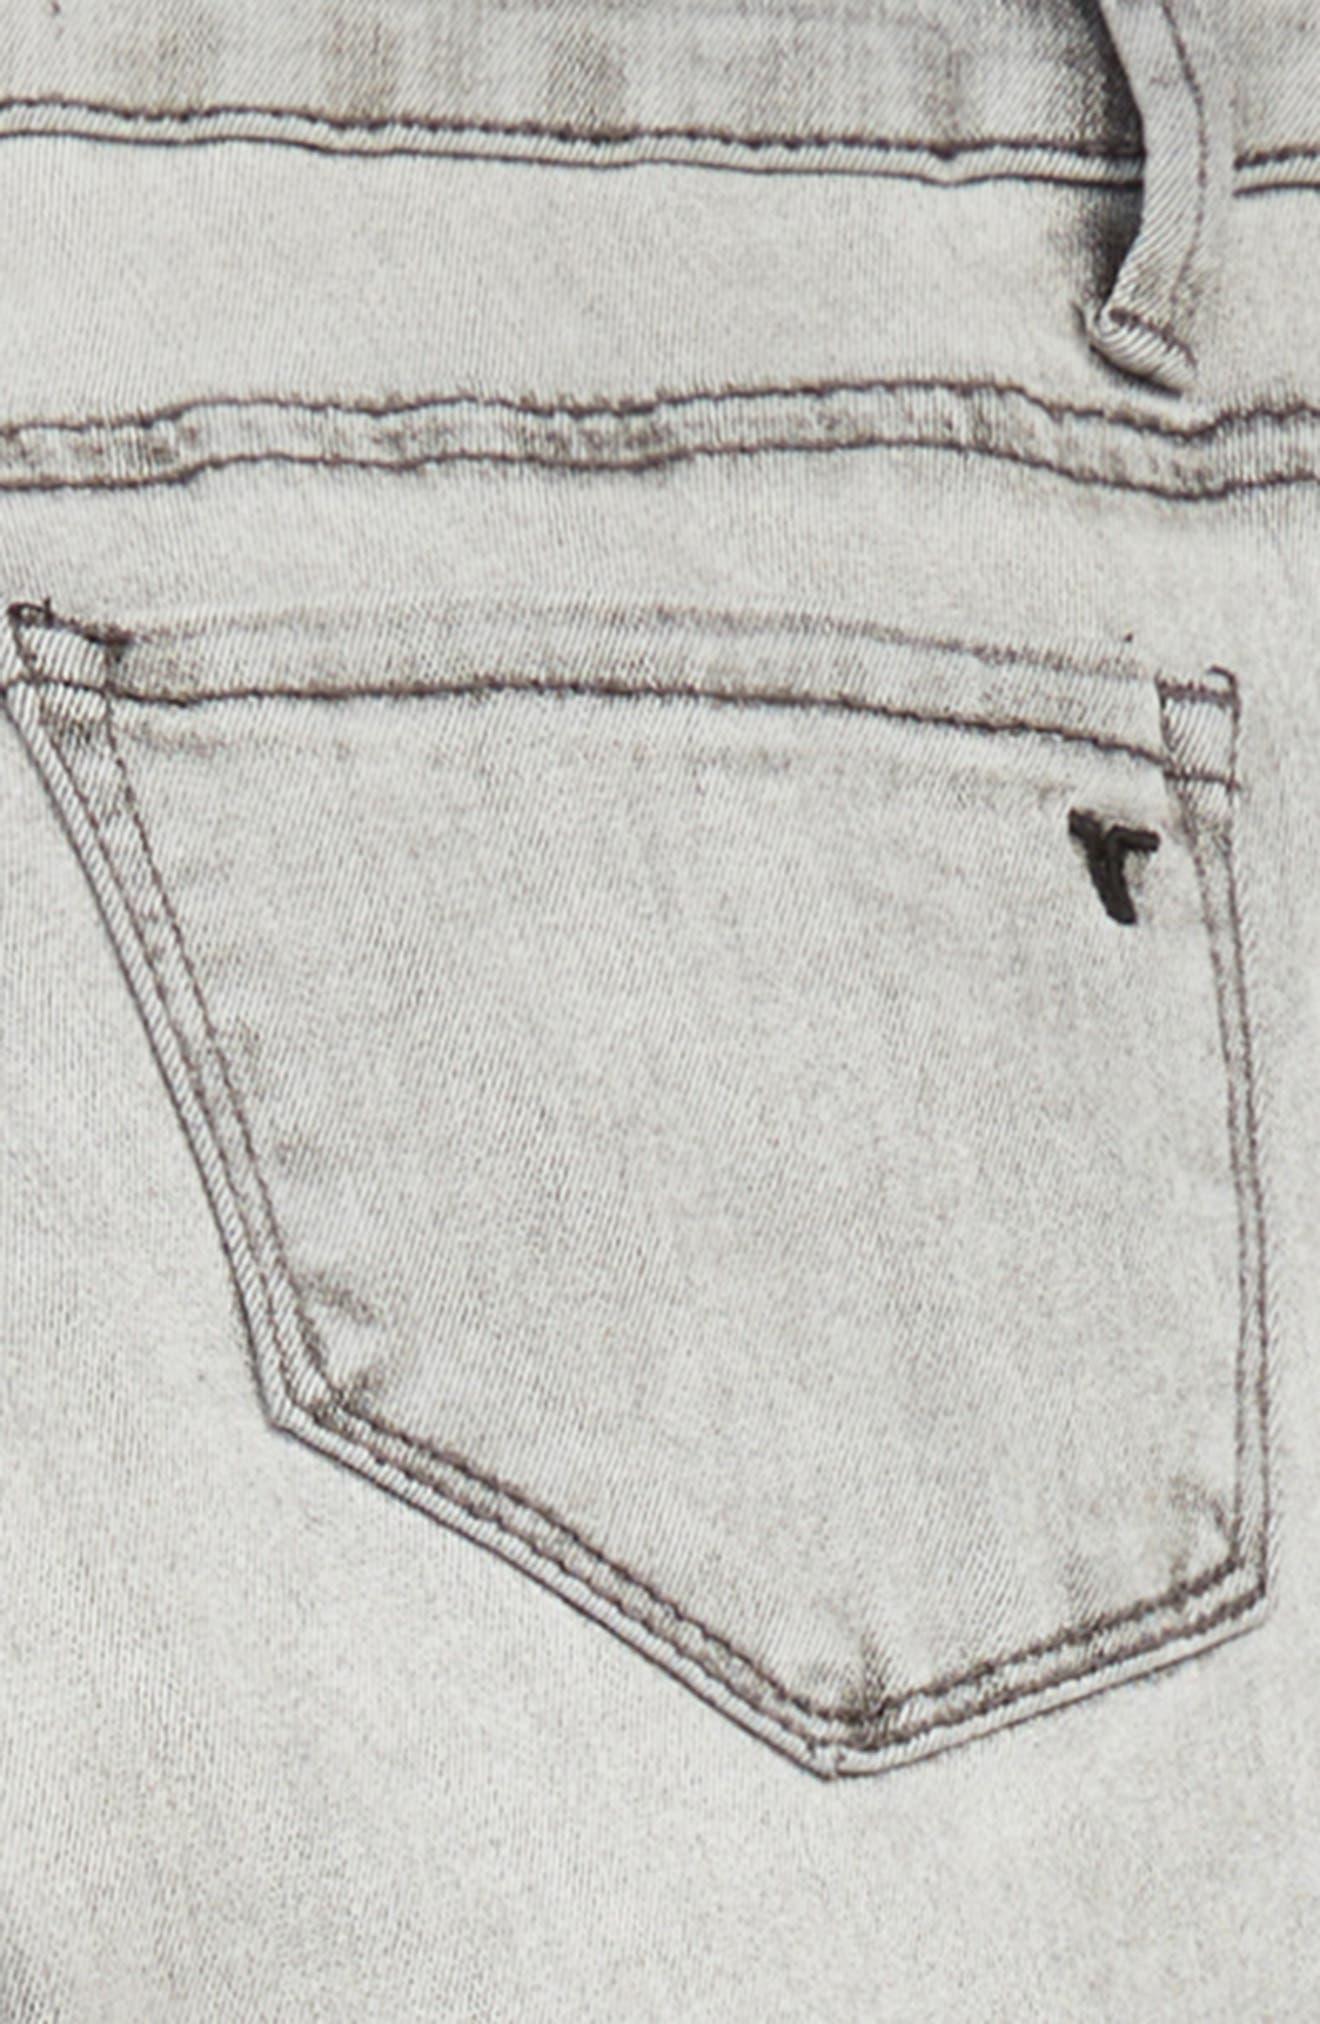 Embellished Tuxedo Stripe Skinny Jeans,                             Alternate thumbnail 3, color,                             CHARCOAL